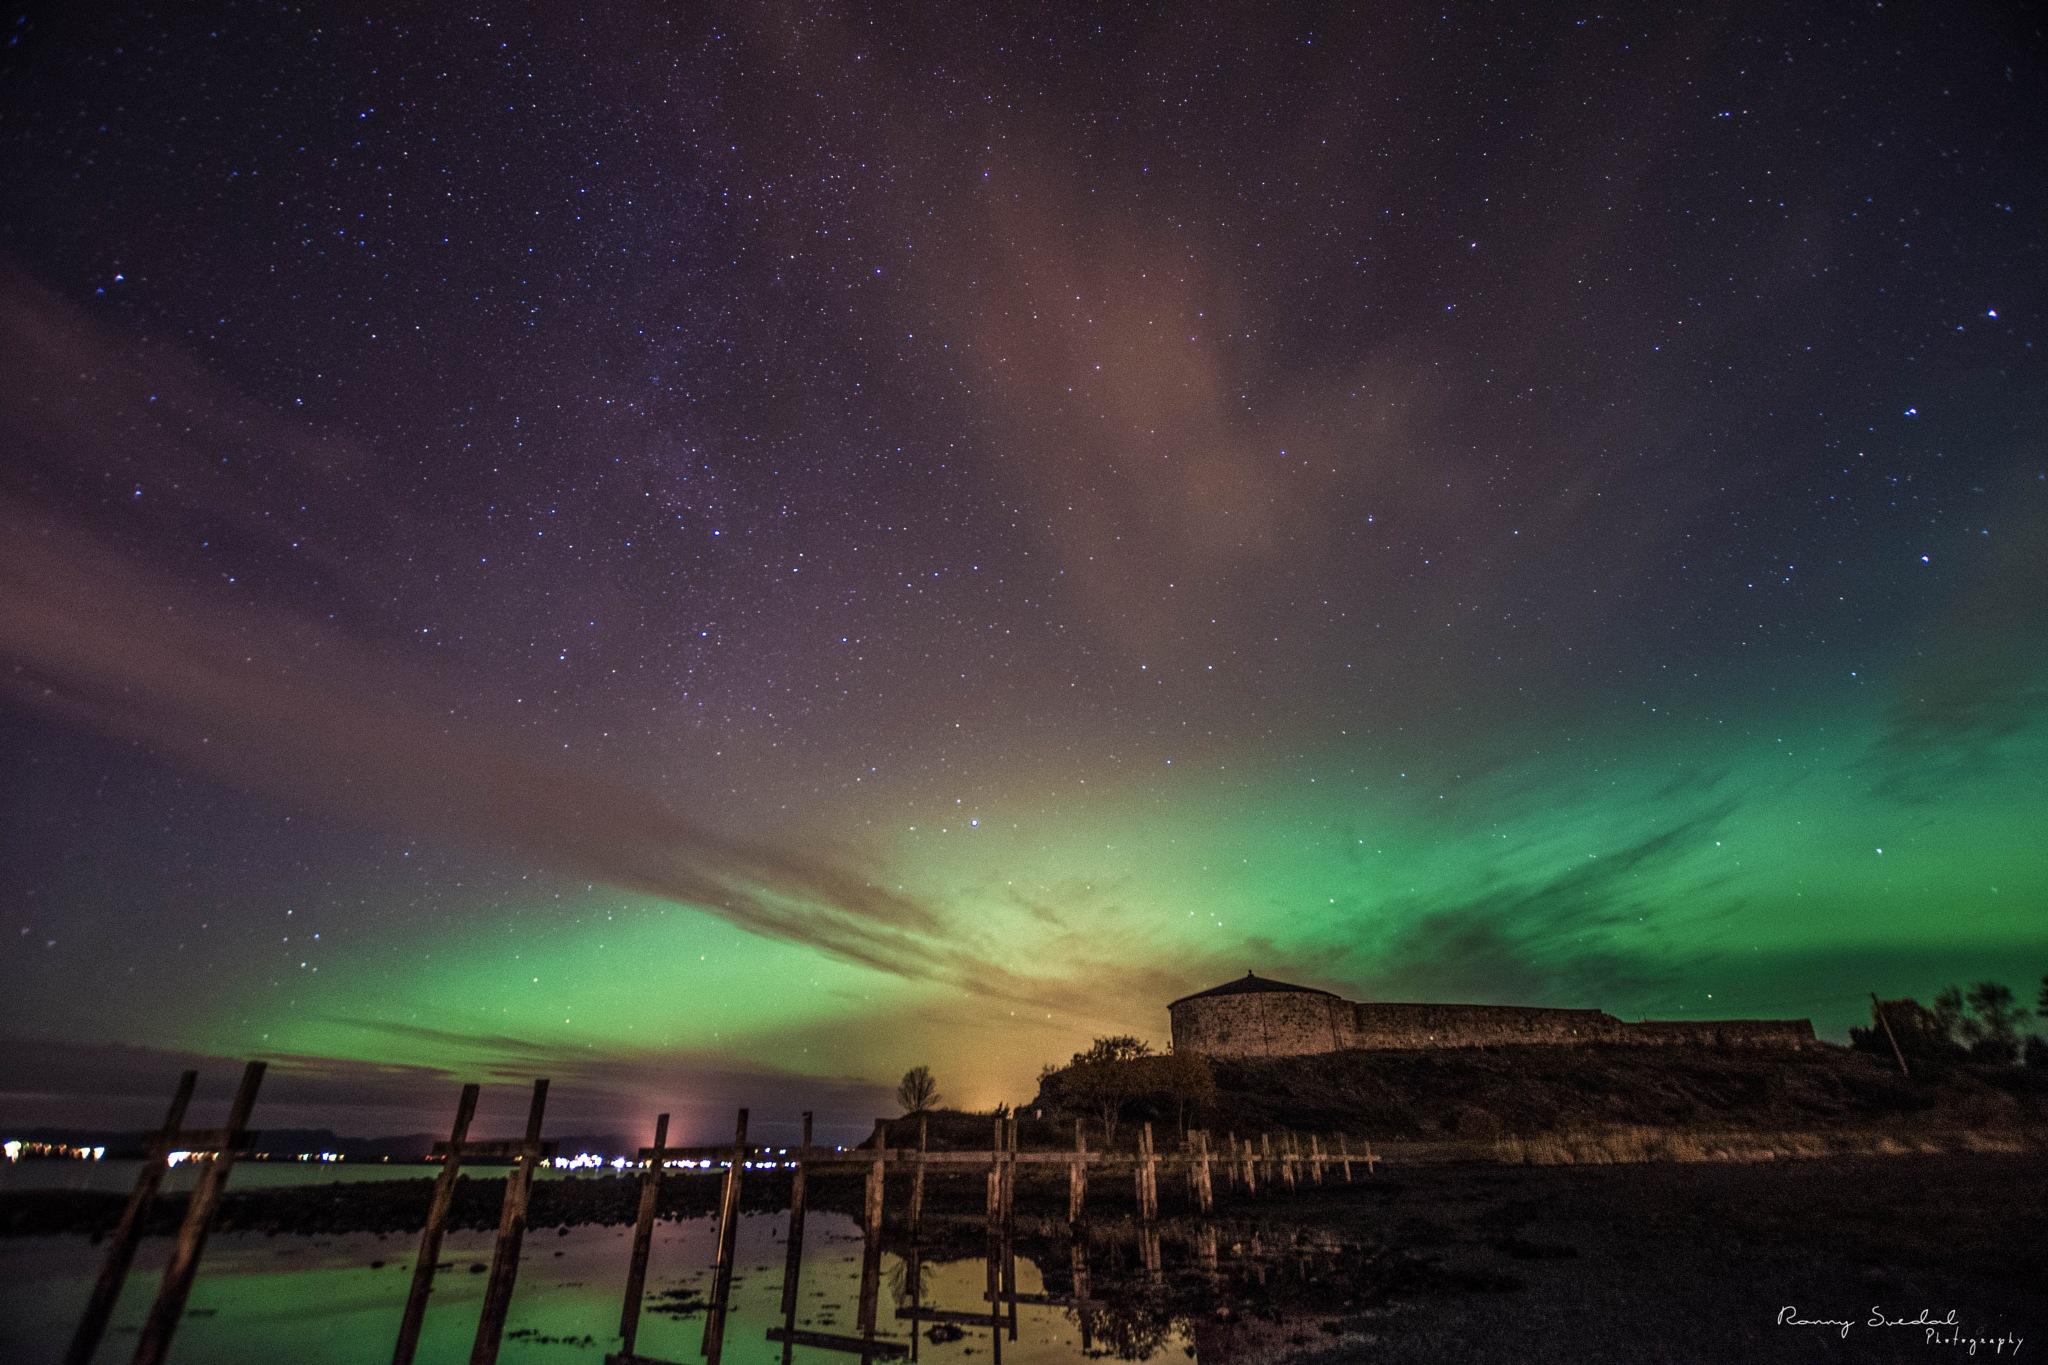 Castle Steinvikholm by Ronny Johansen Svedal